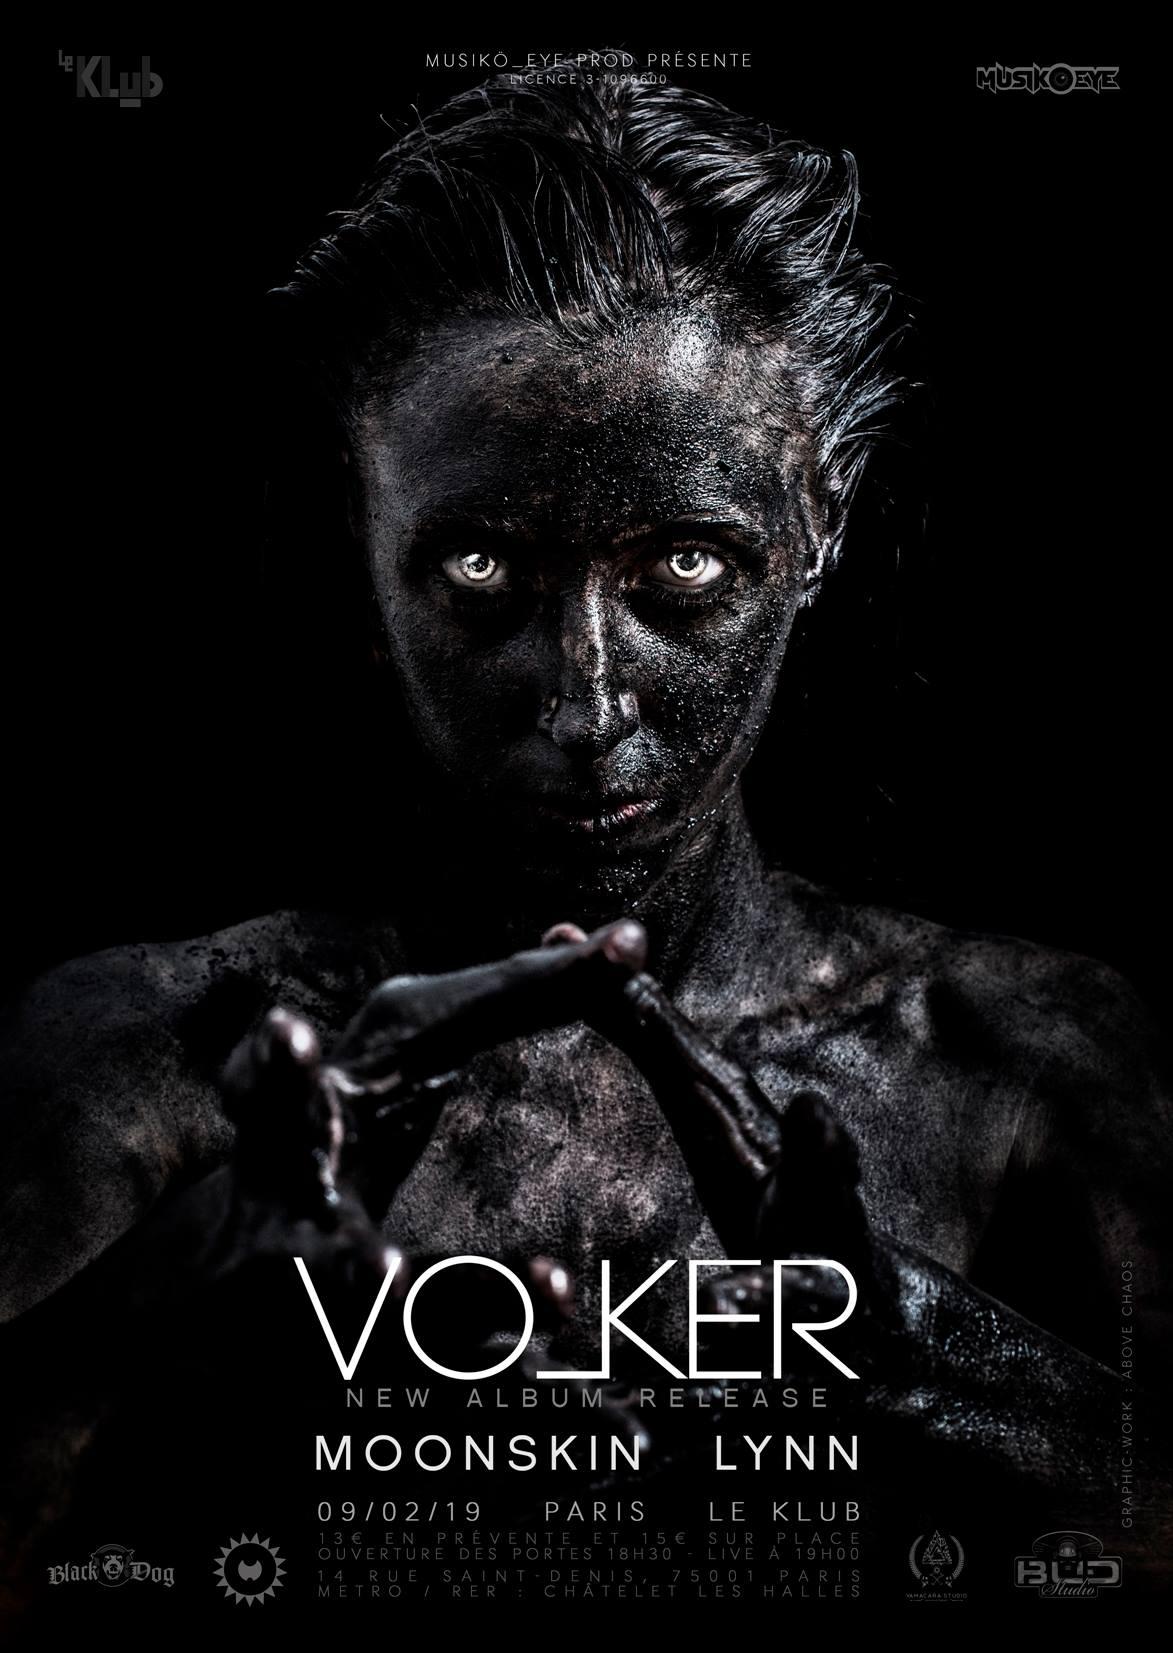 Volker + Moonskin + Lynn ■ 09.02